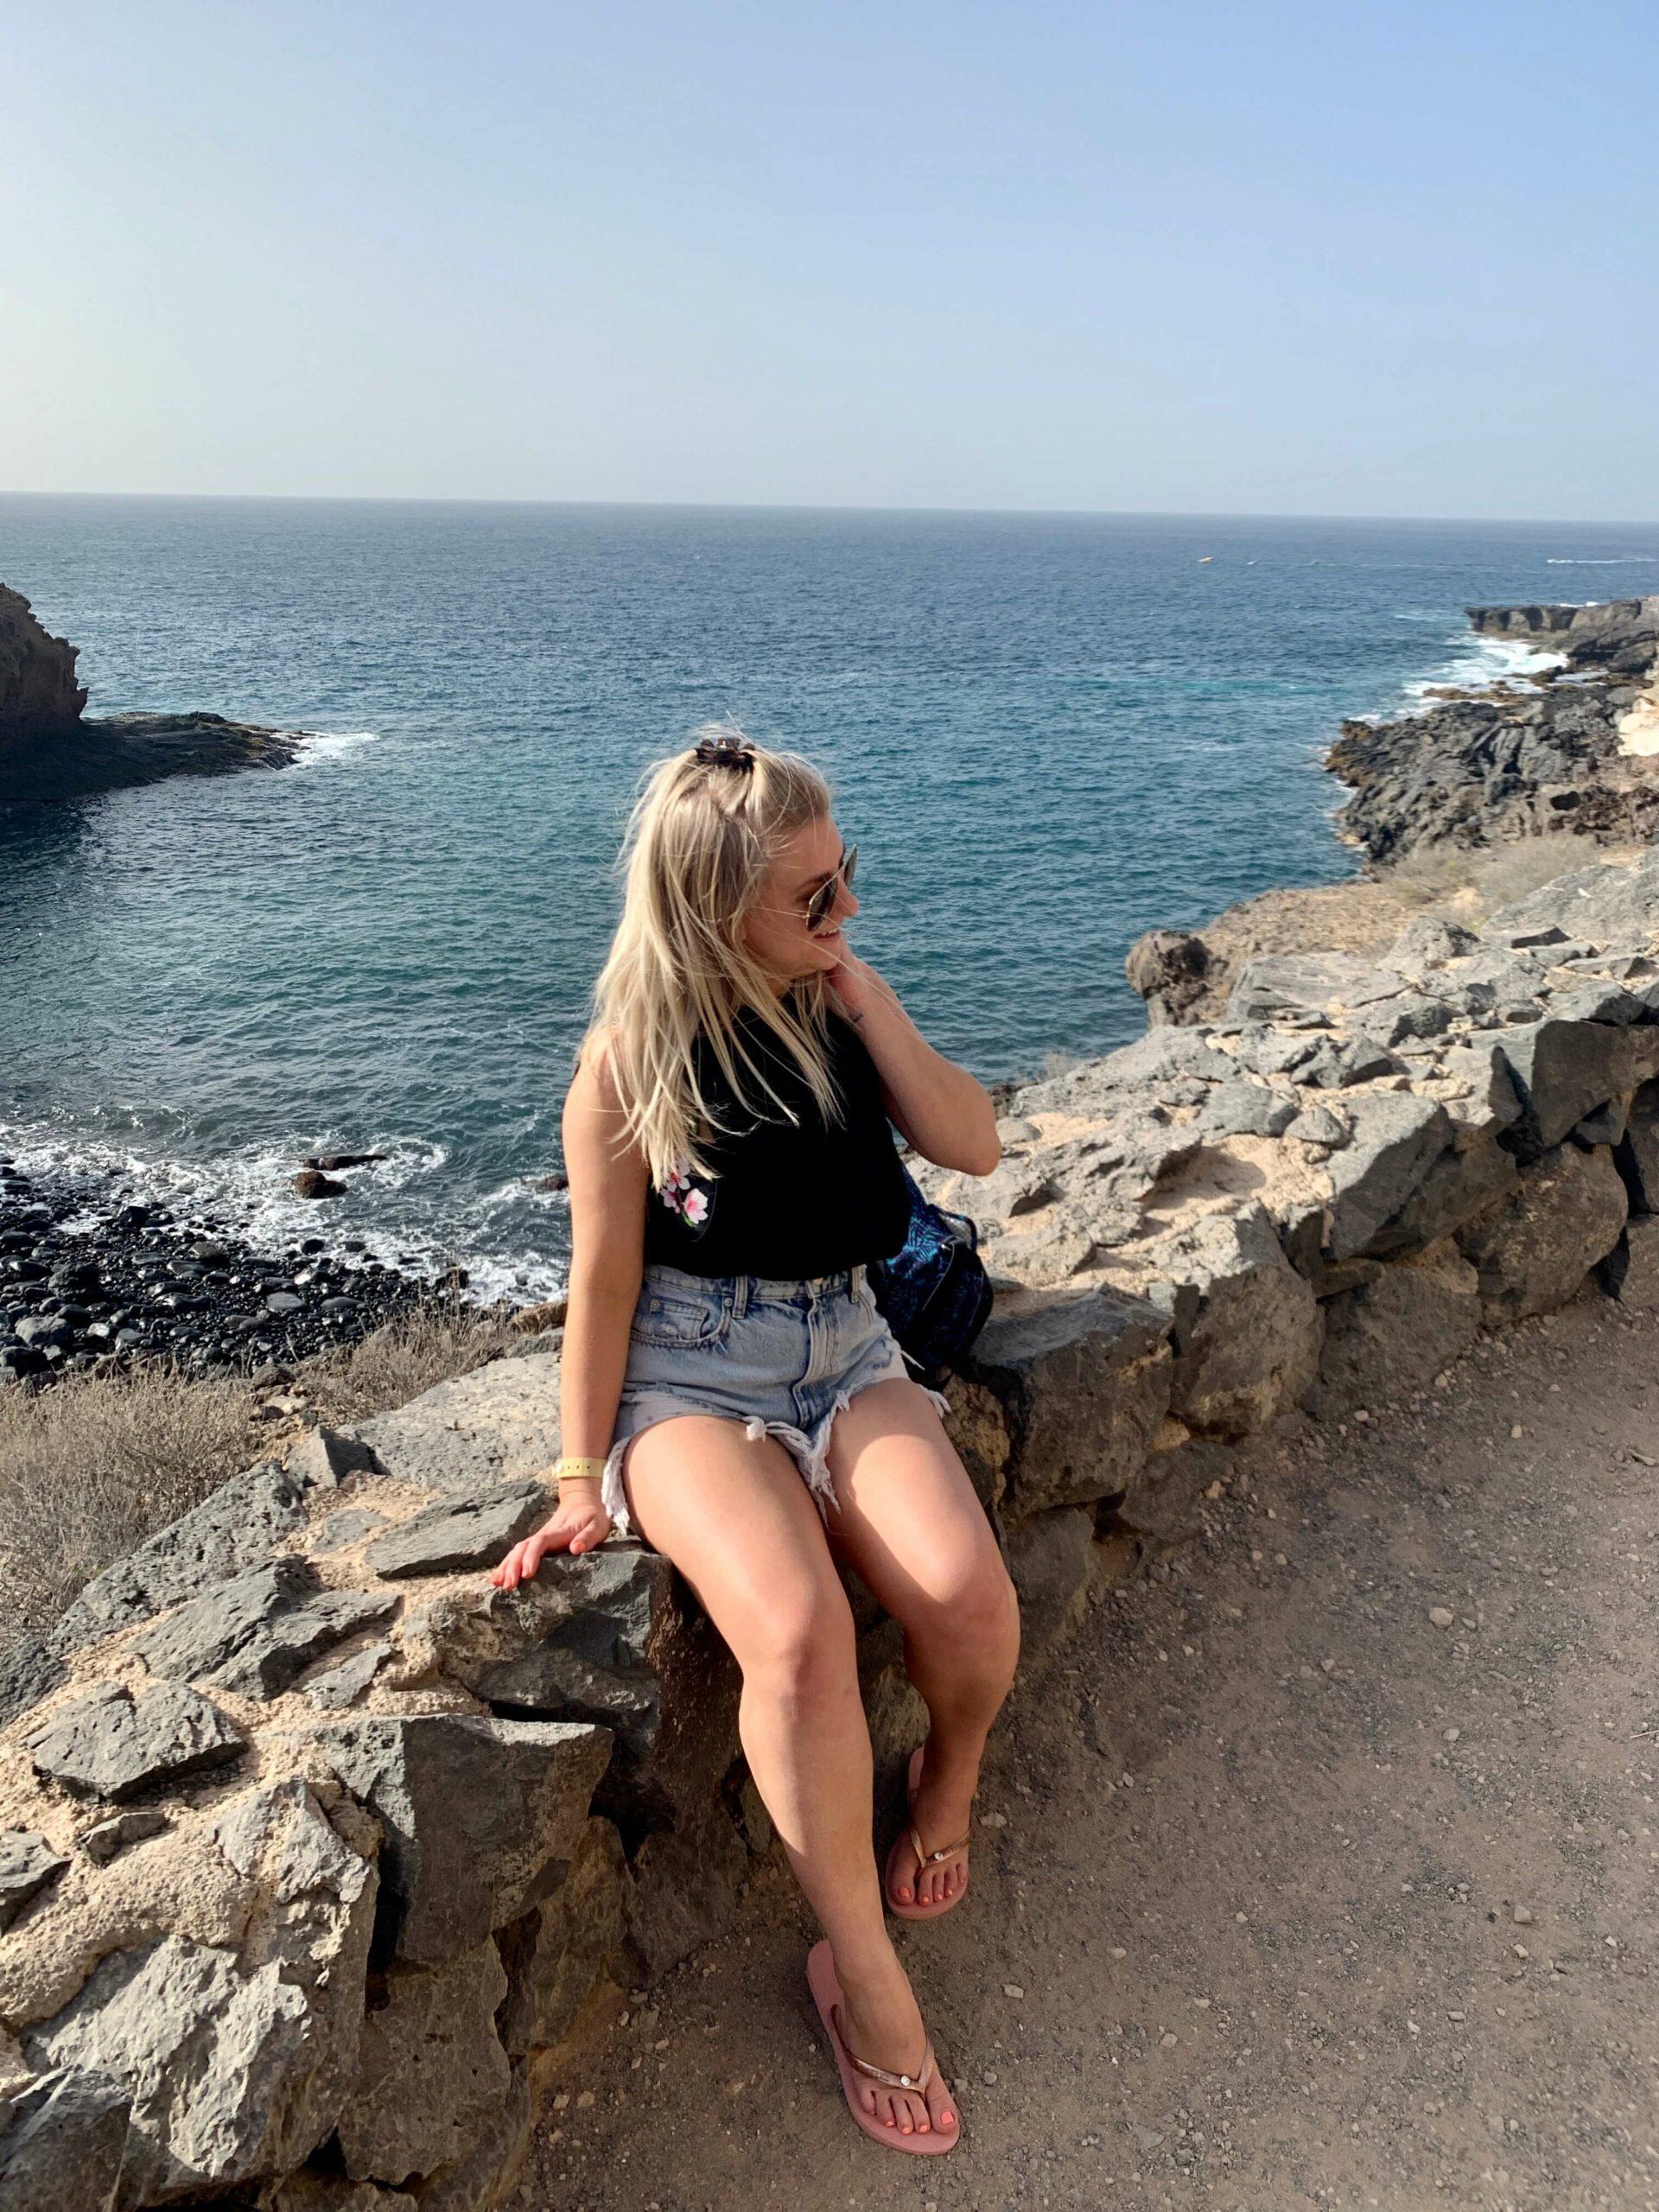 Coastal walks in Tenerife